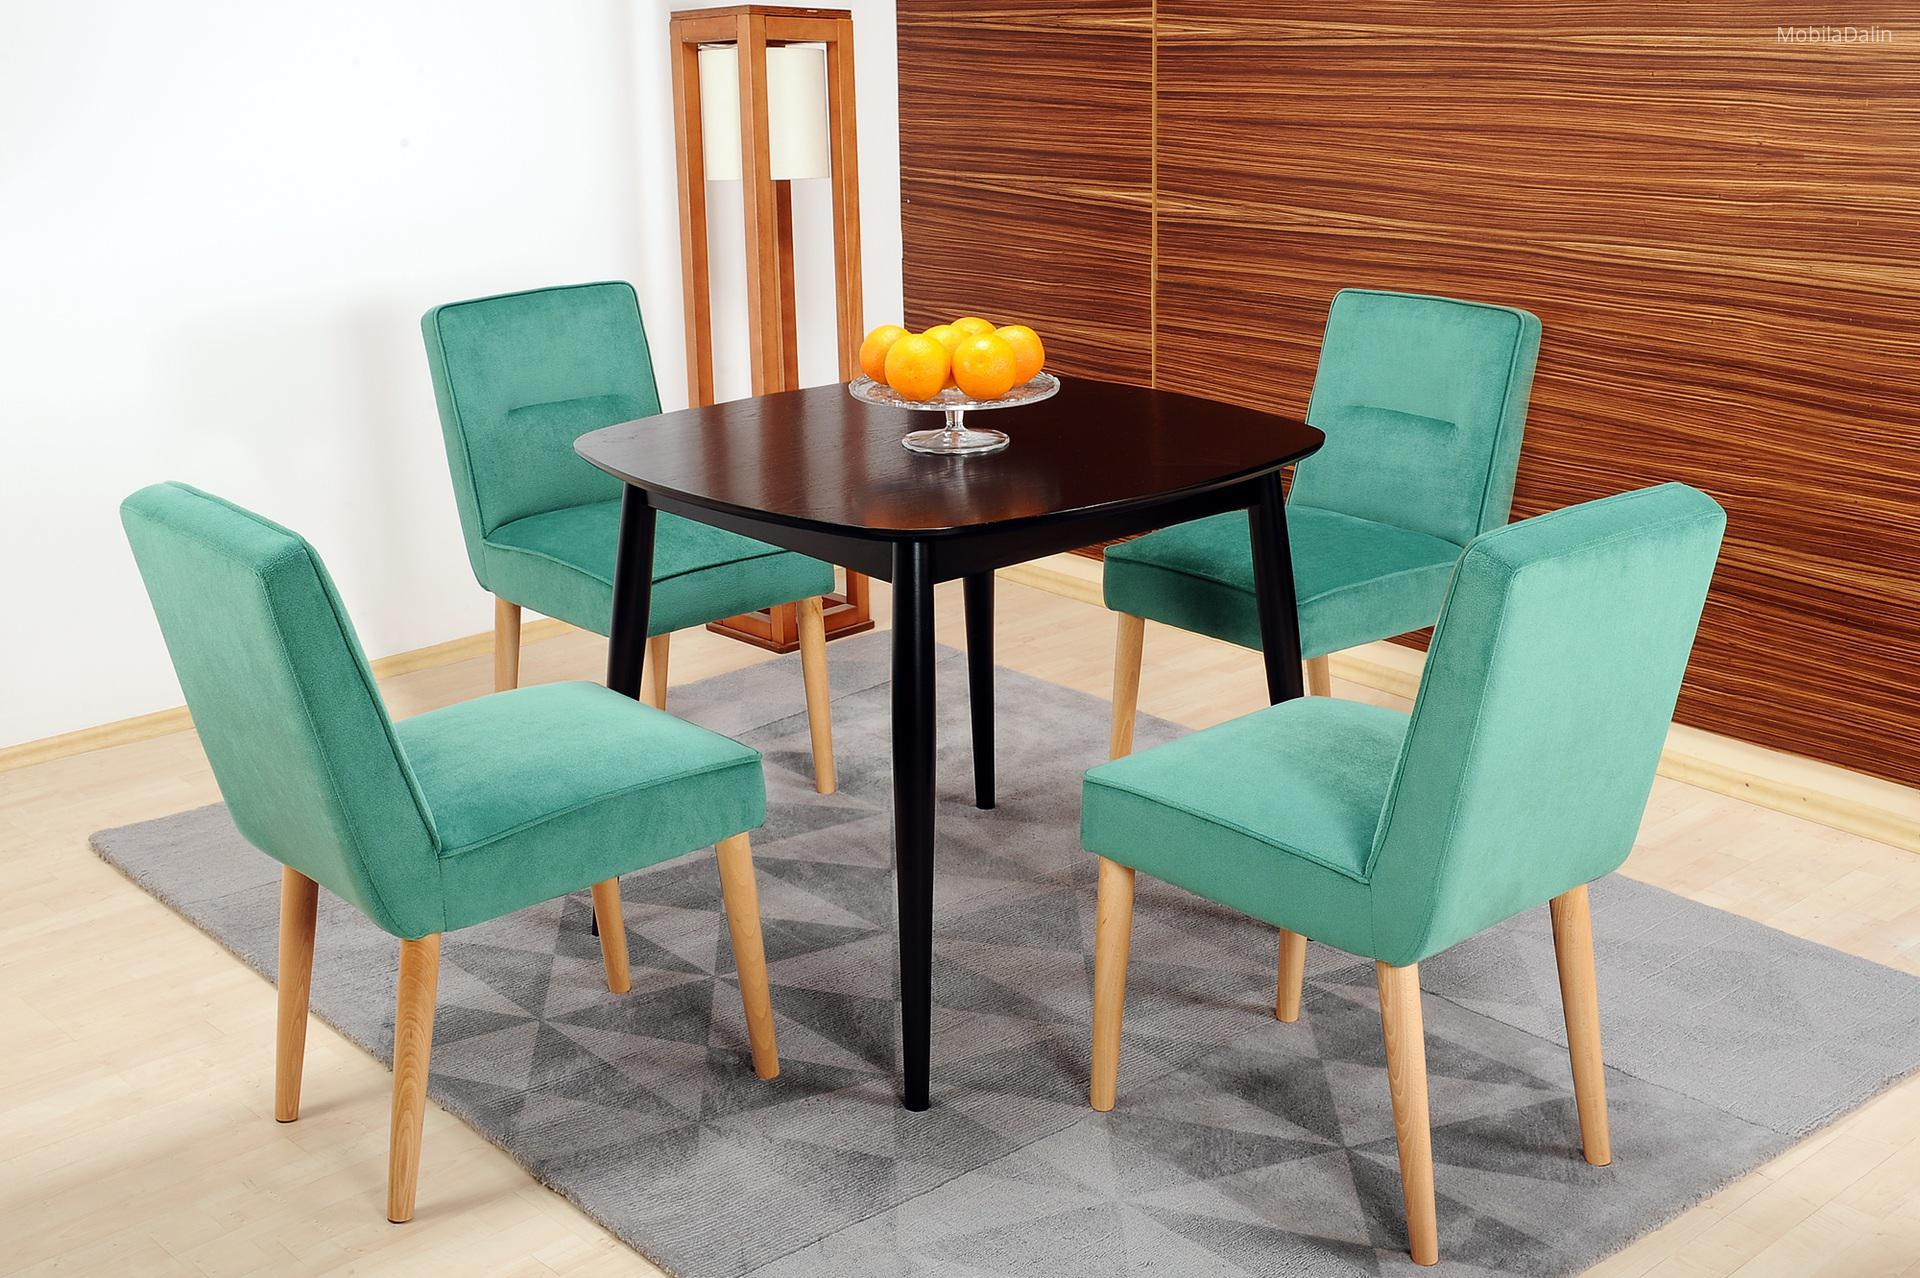 Stockholm szék - HOMEINFO a101f337a9